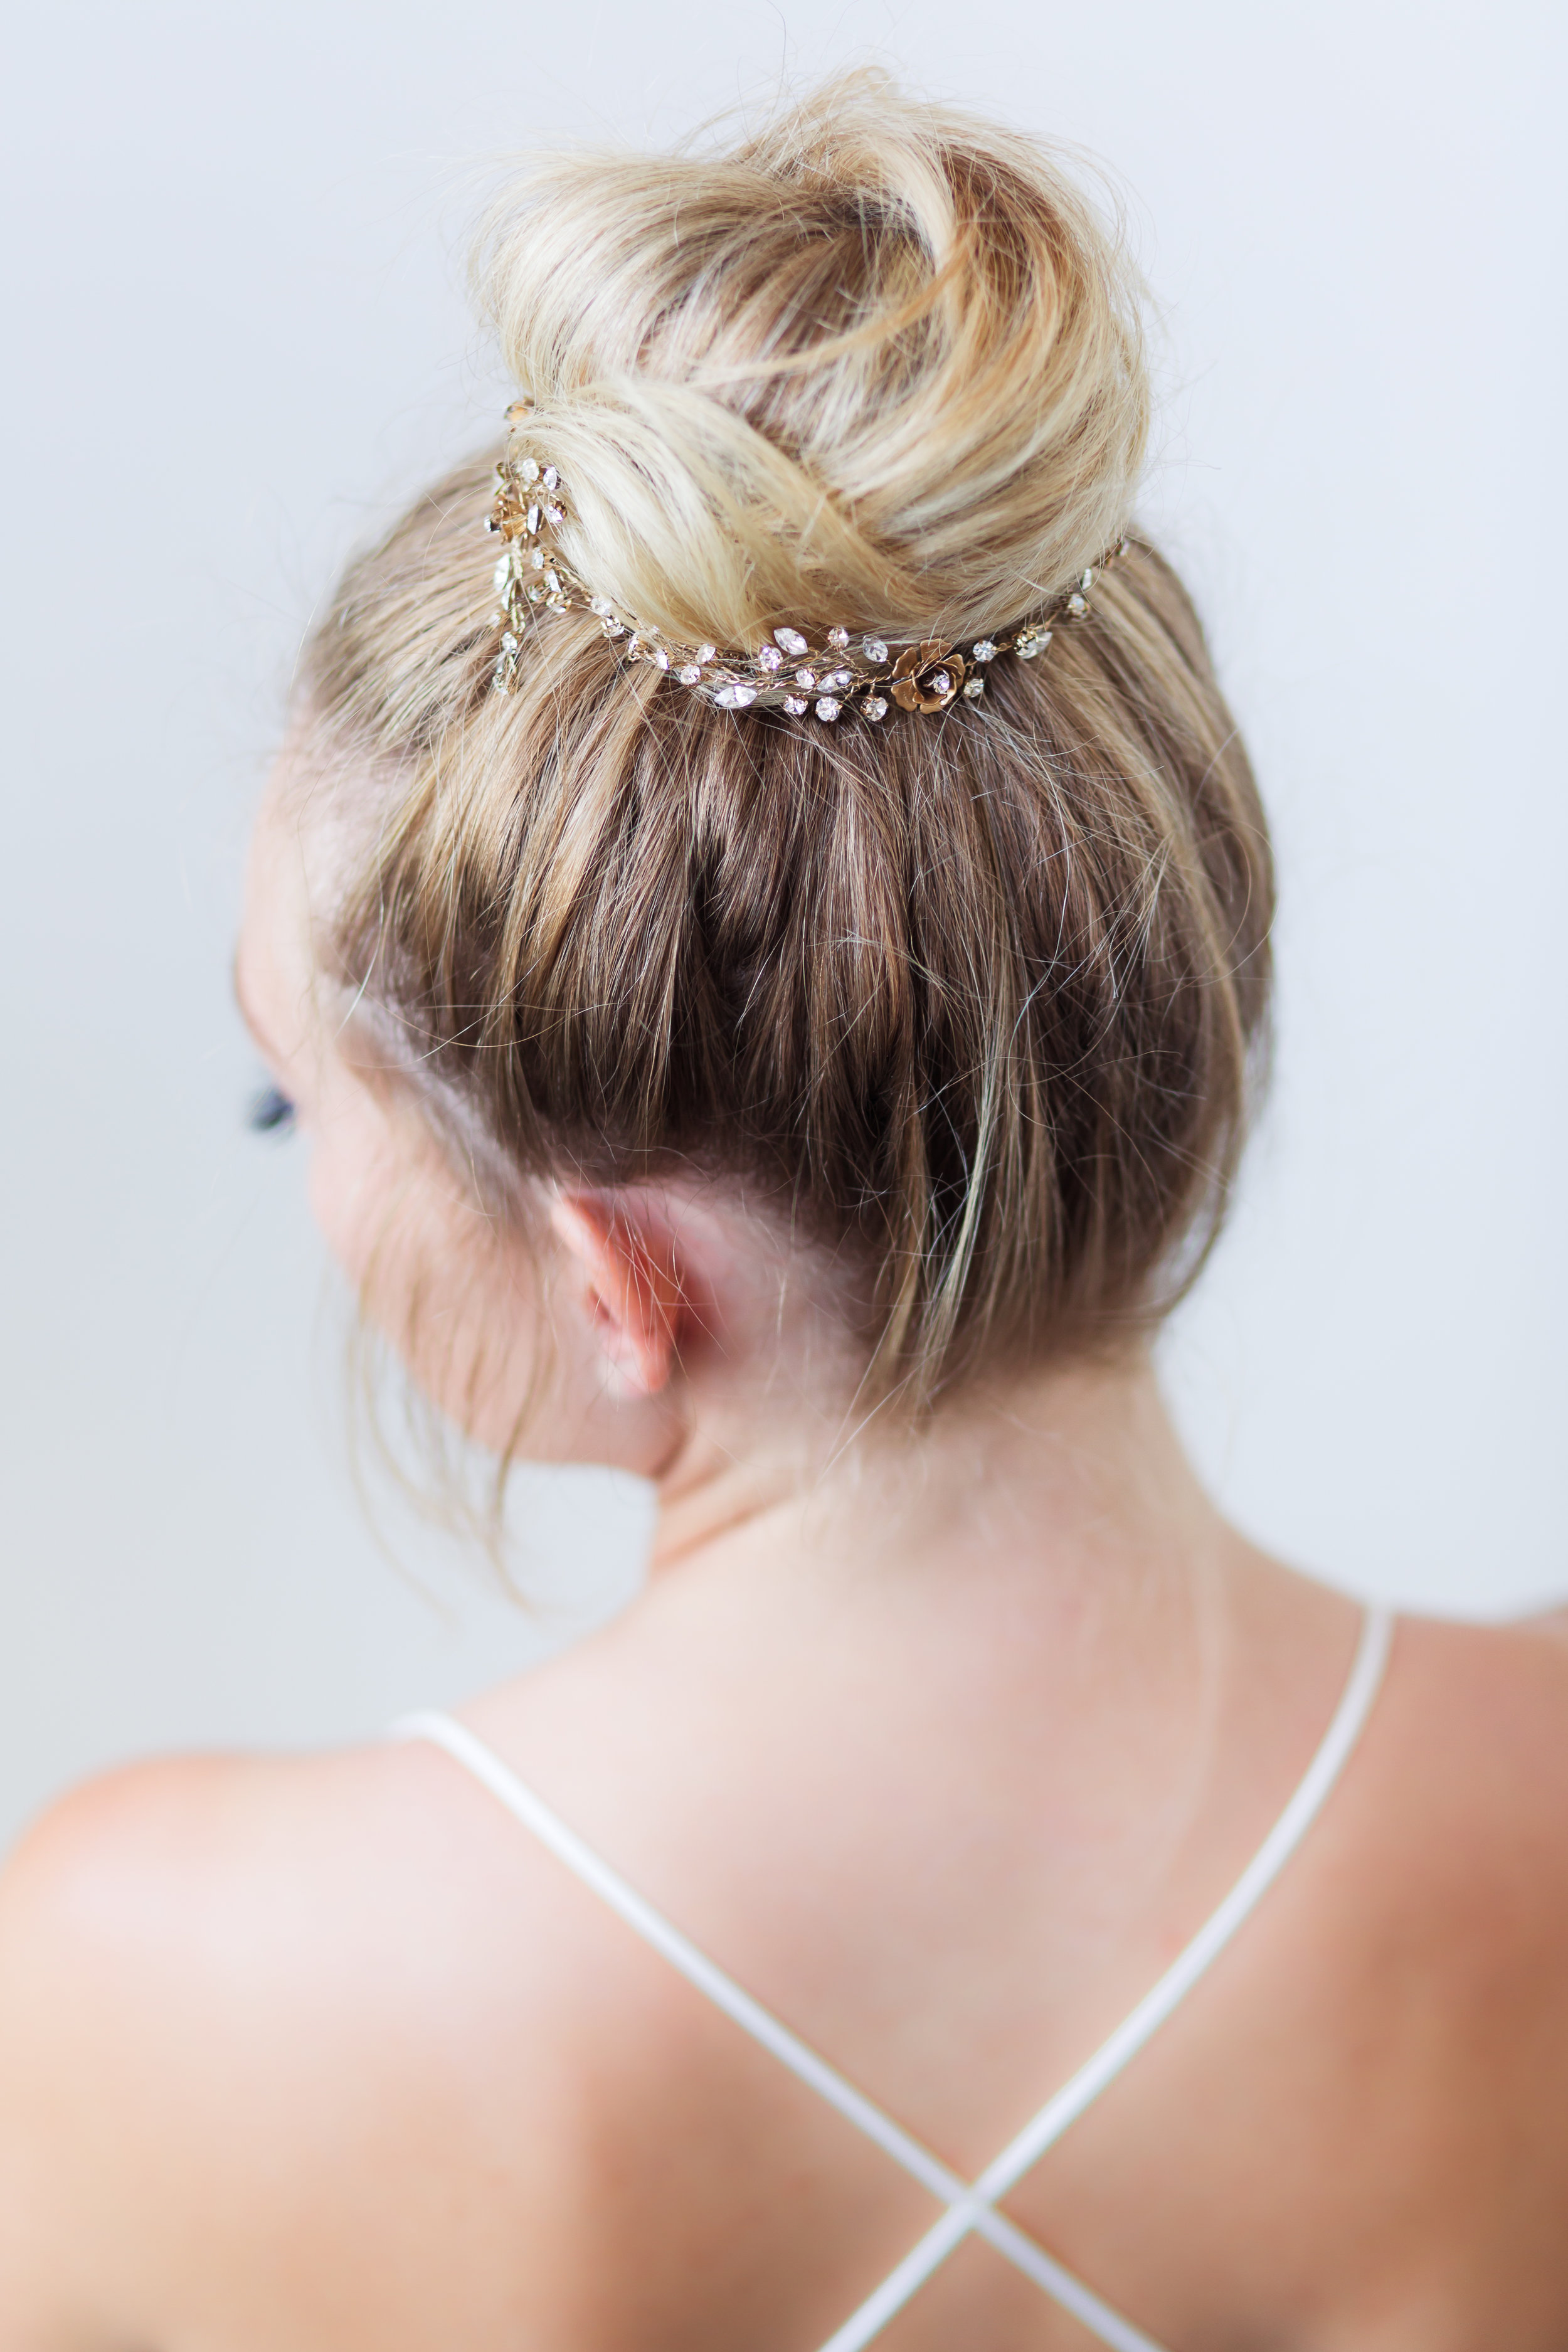 Wear a bridal hair vine in updo